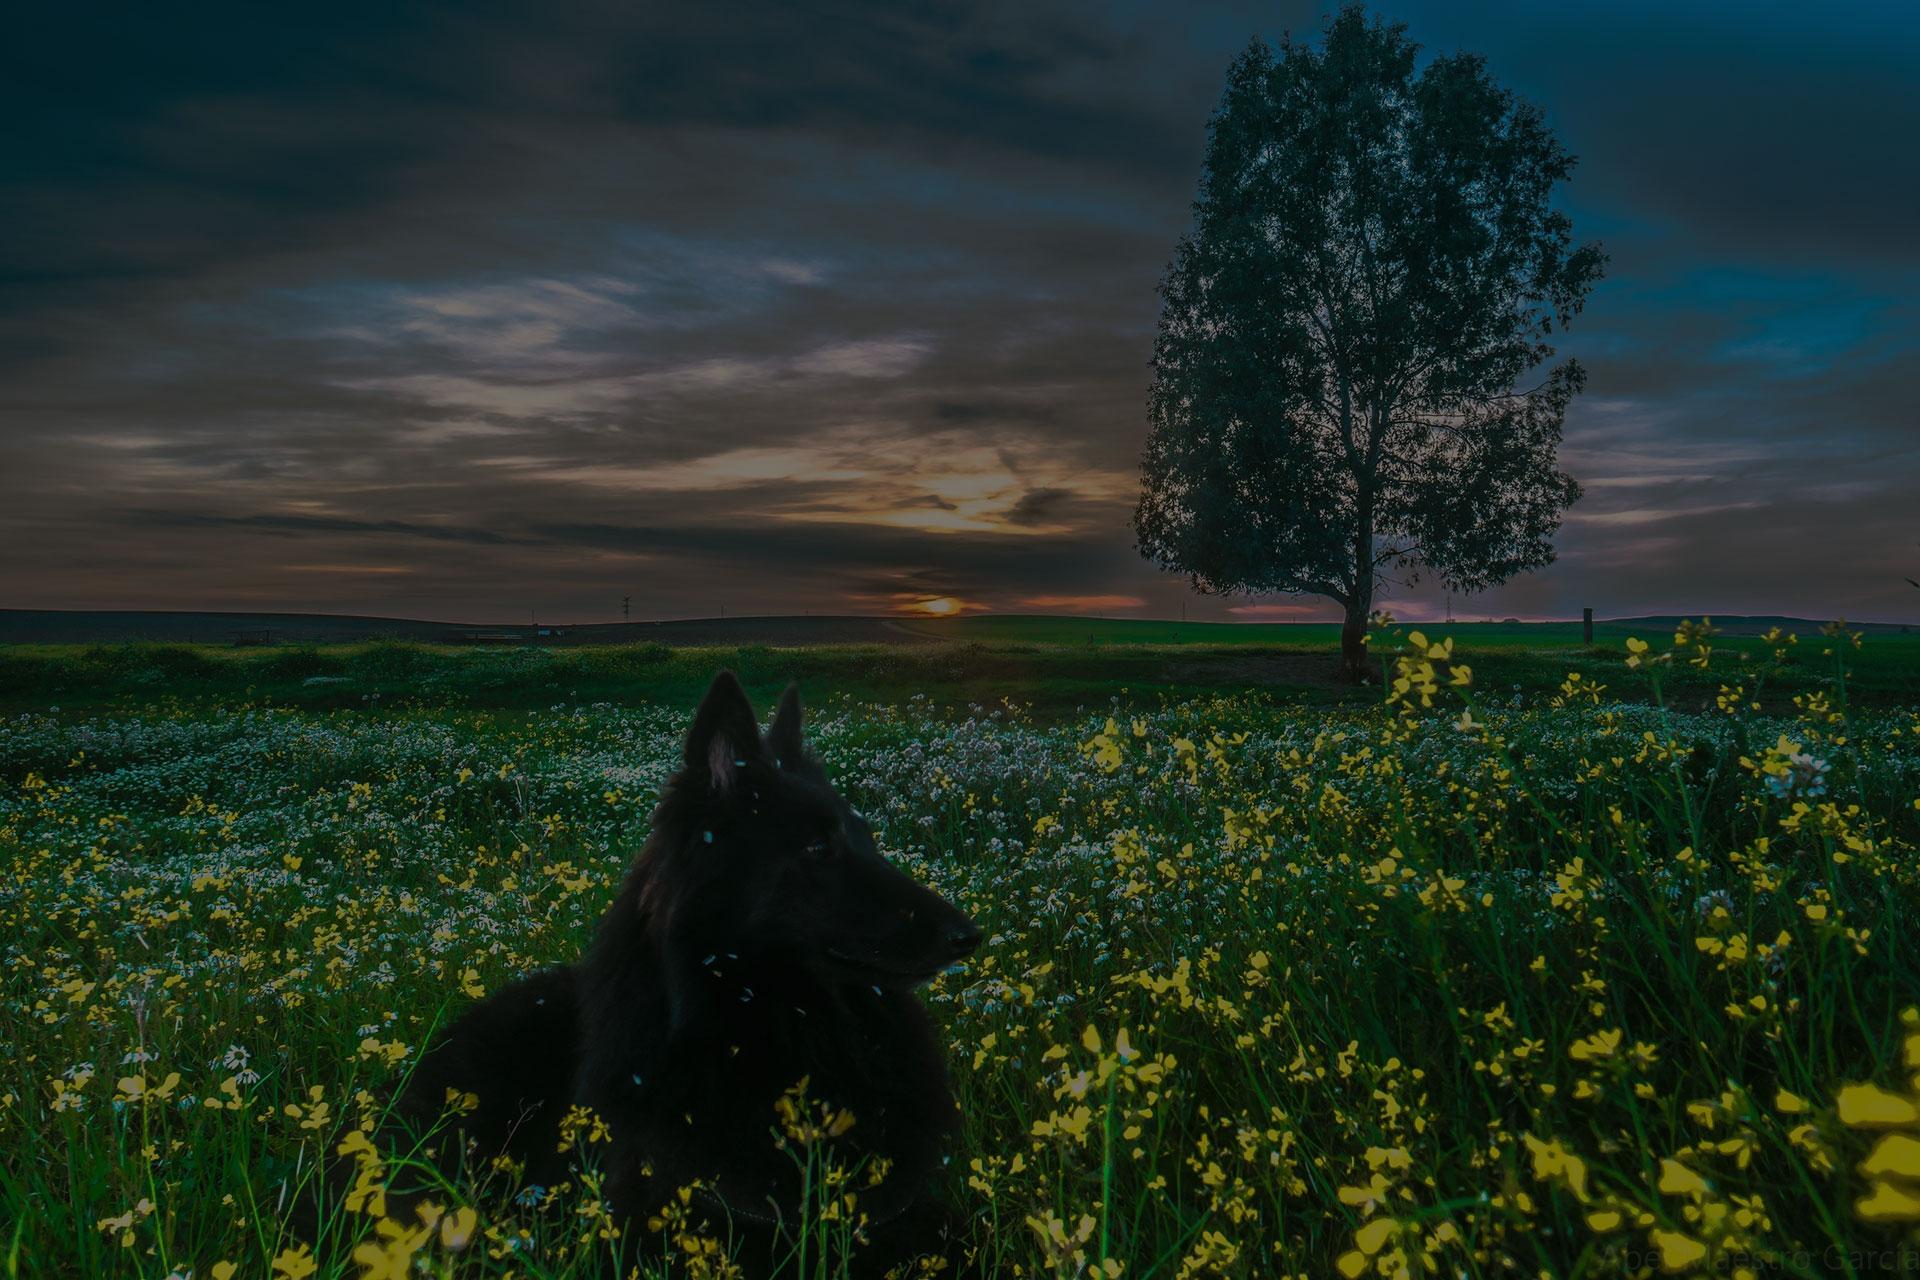 Black Canine Close Up Belgian Sheepdog Dog Pet